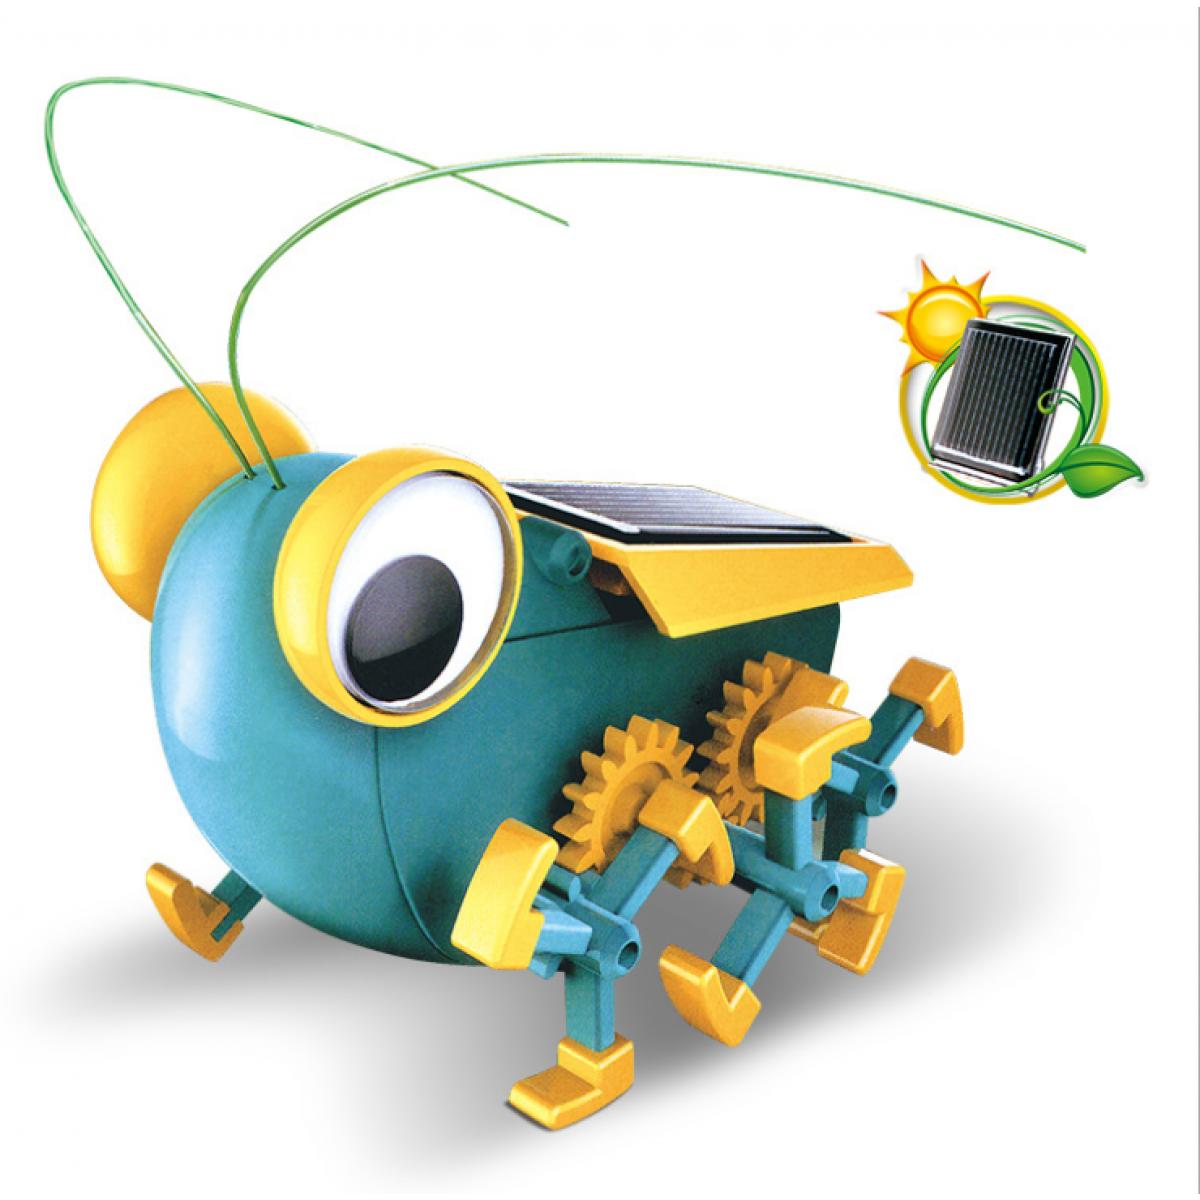 mini science solar robot toy - GARDEN